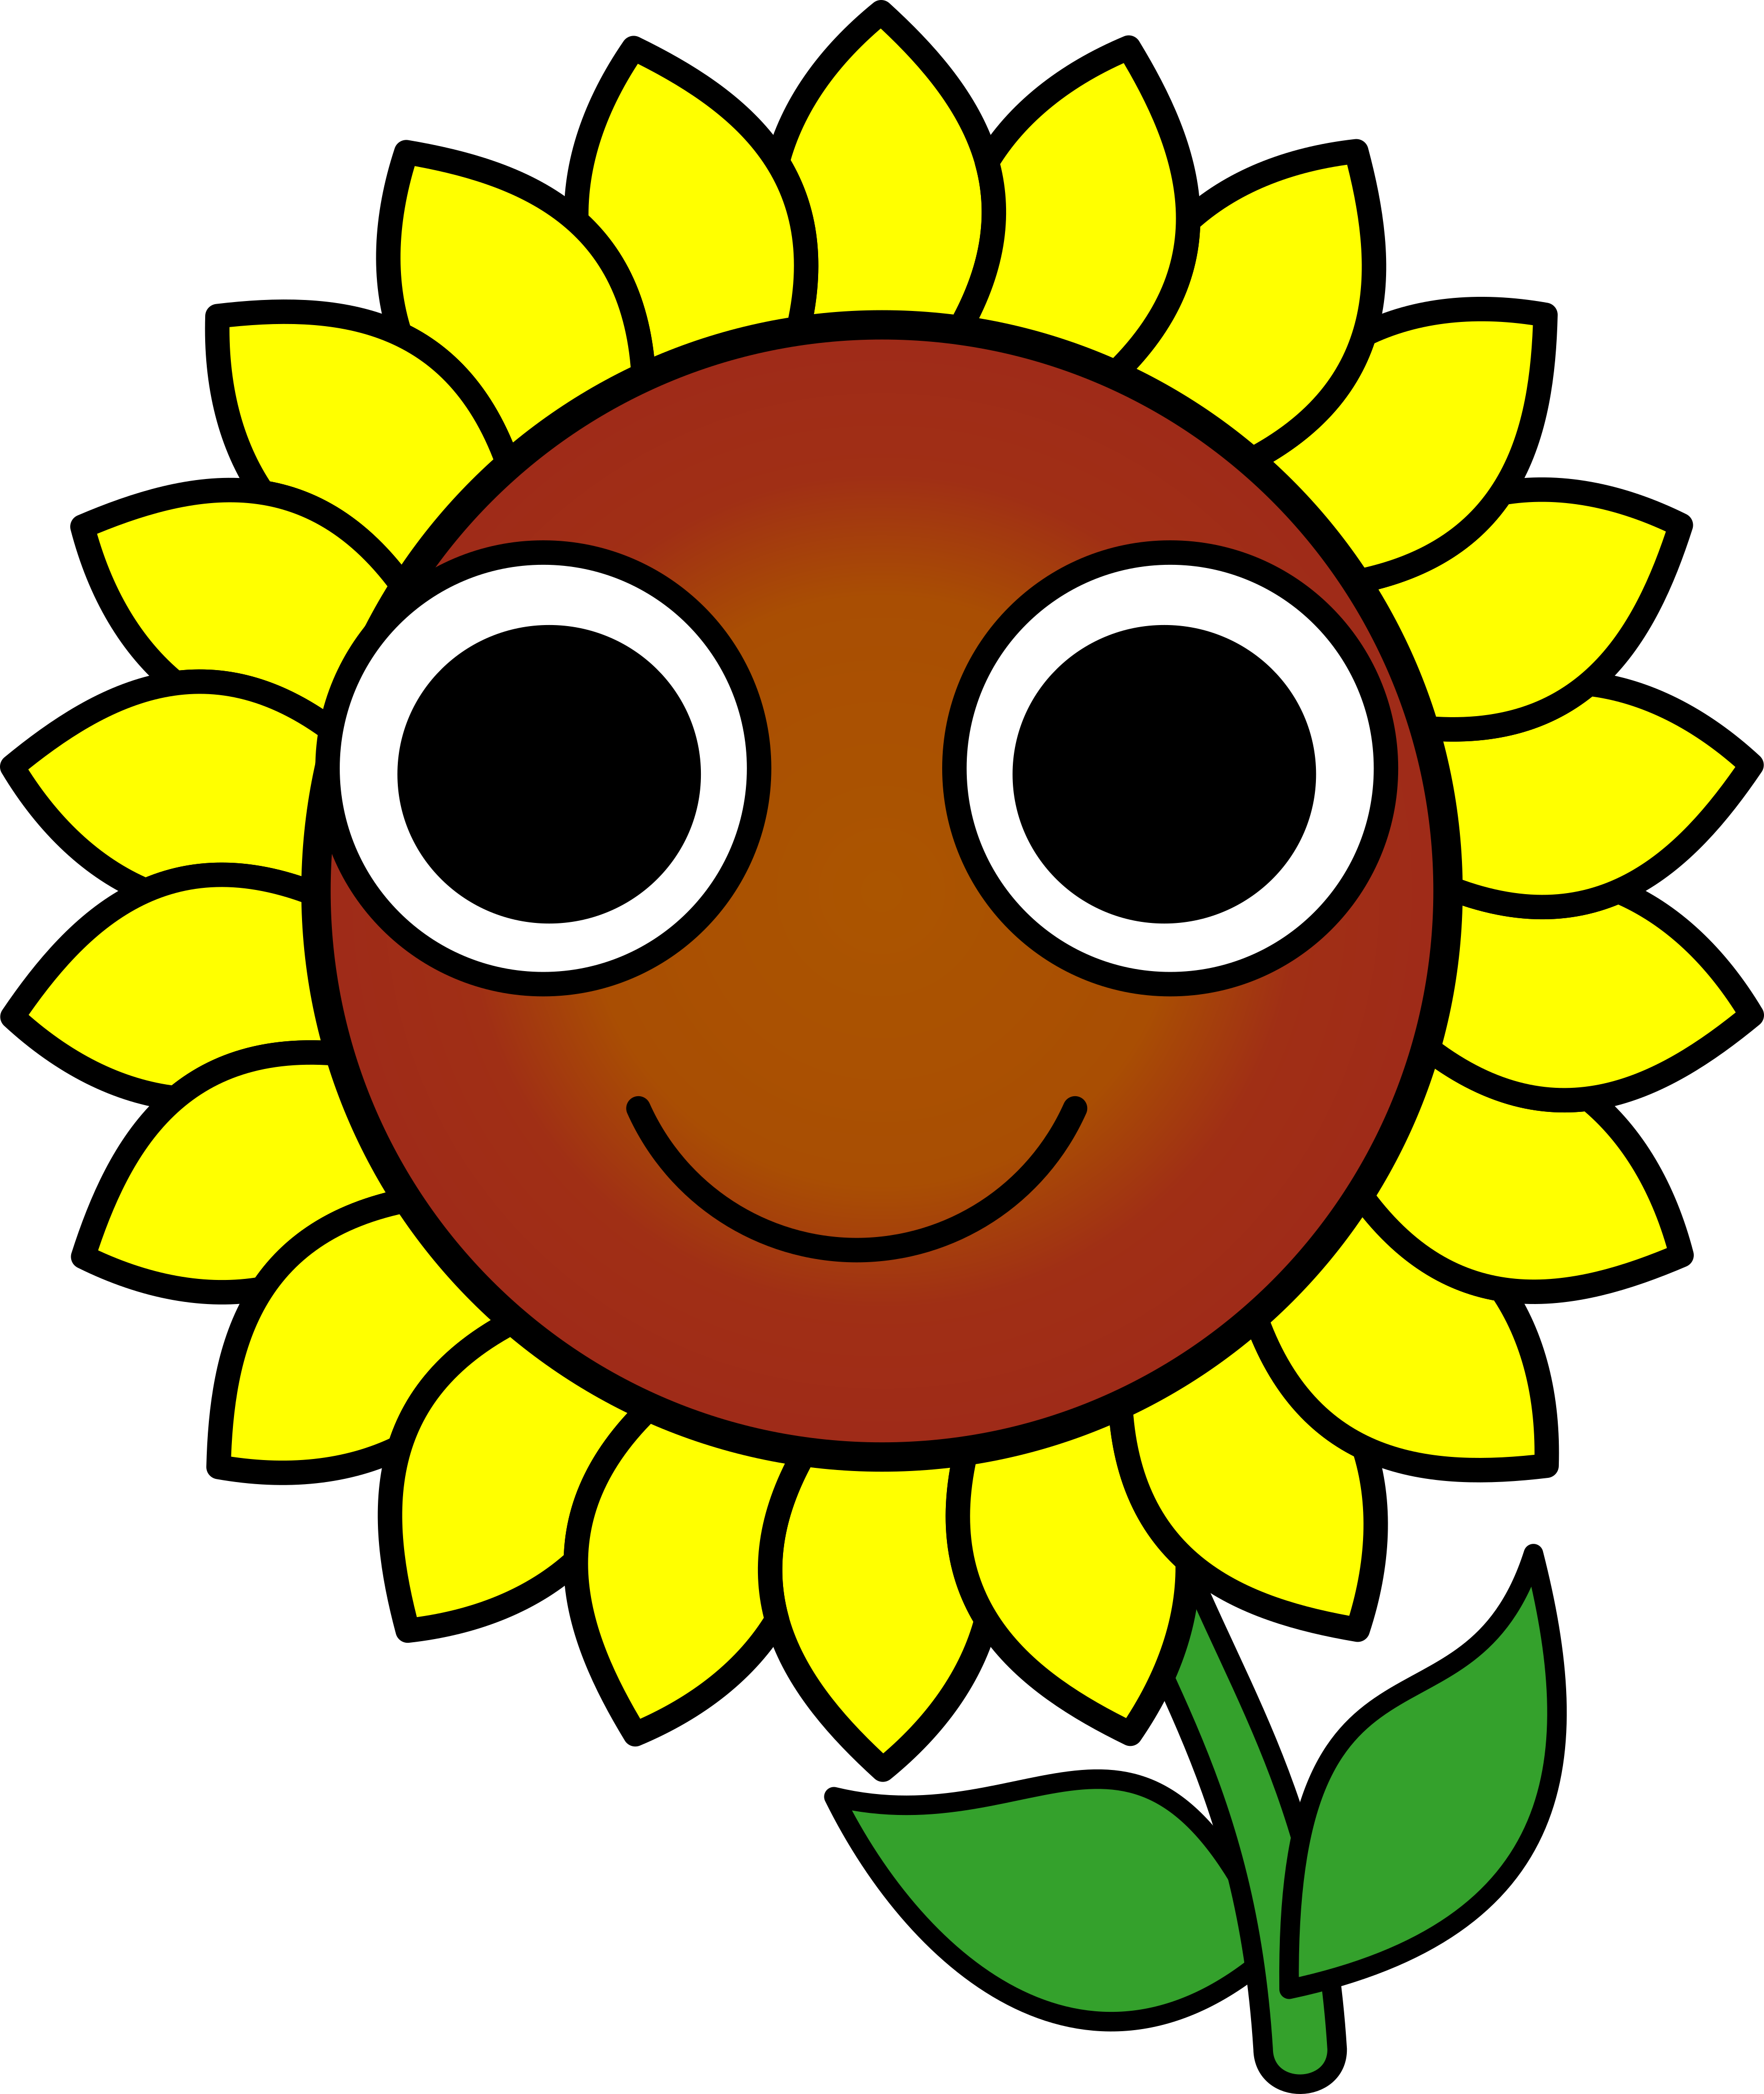 Happy Sunflower Clipart | www.imgkid.com - The Image Kid ...